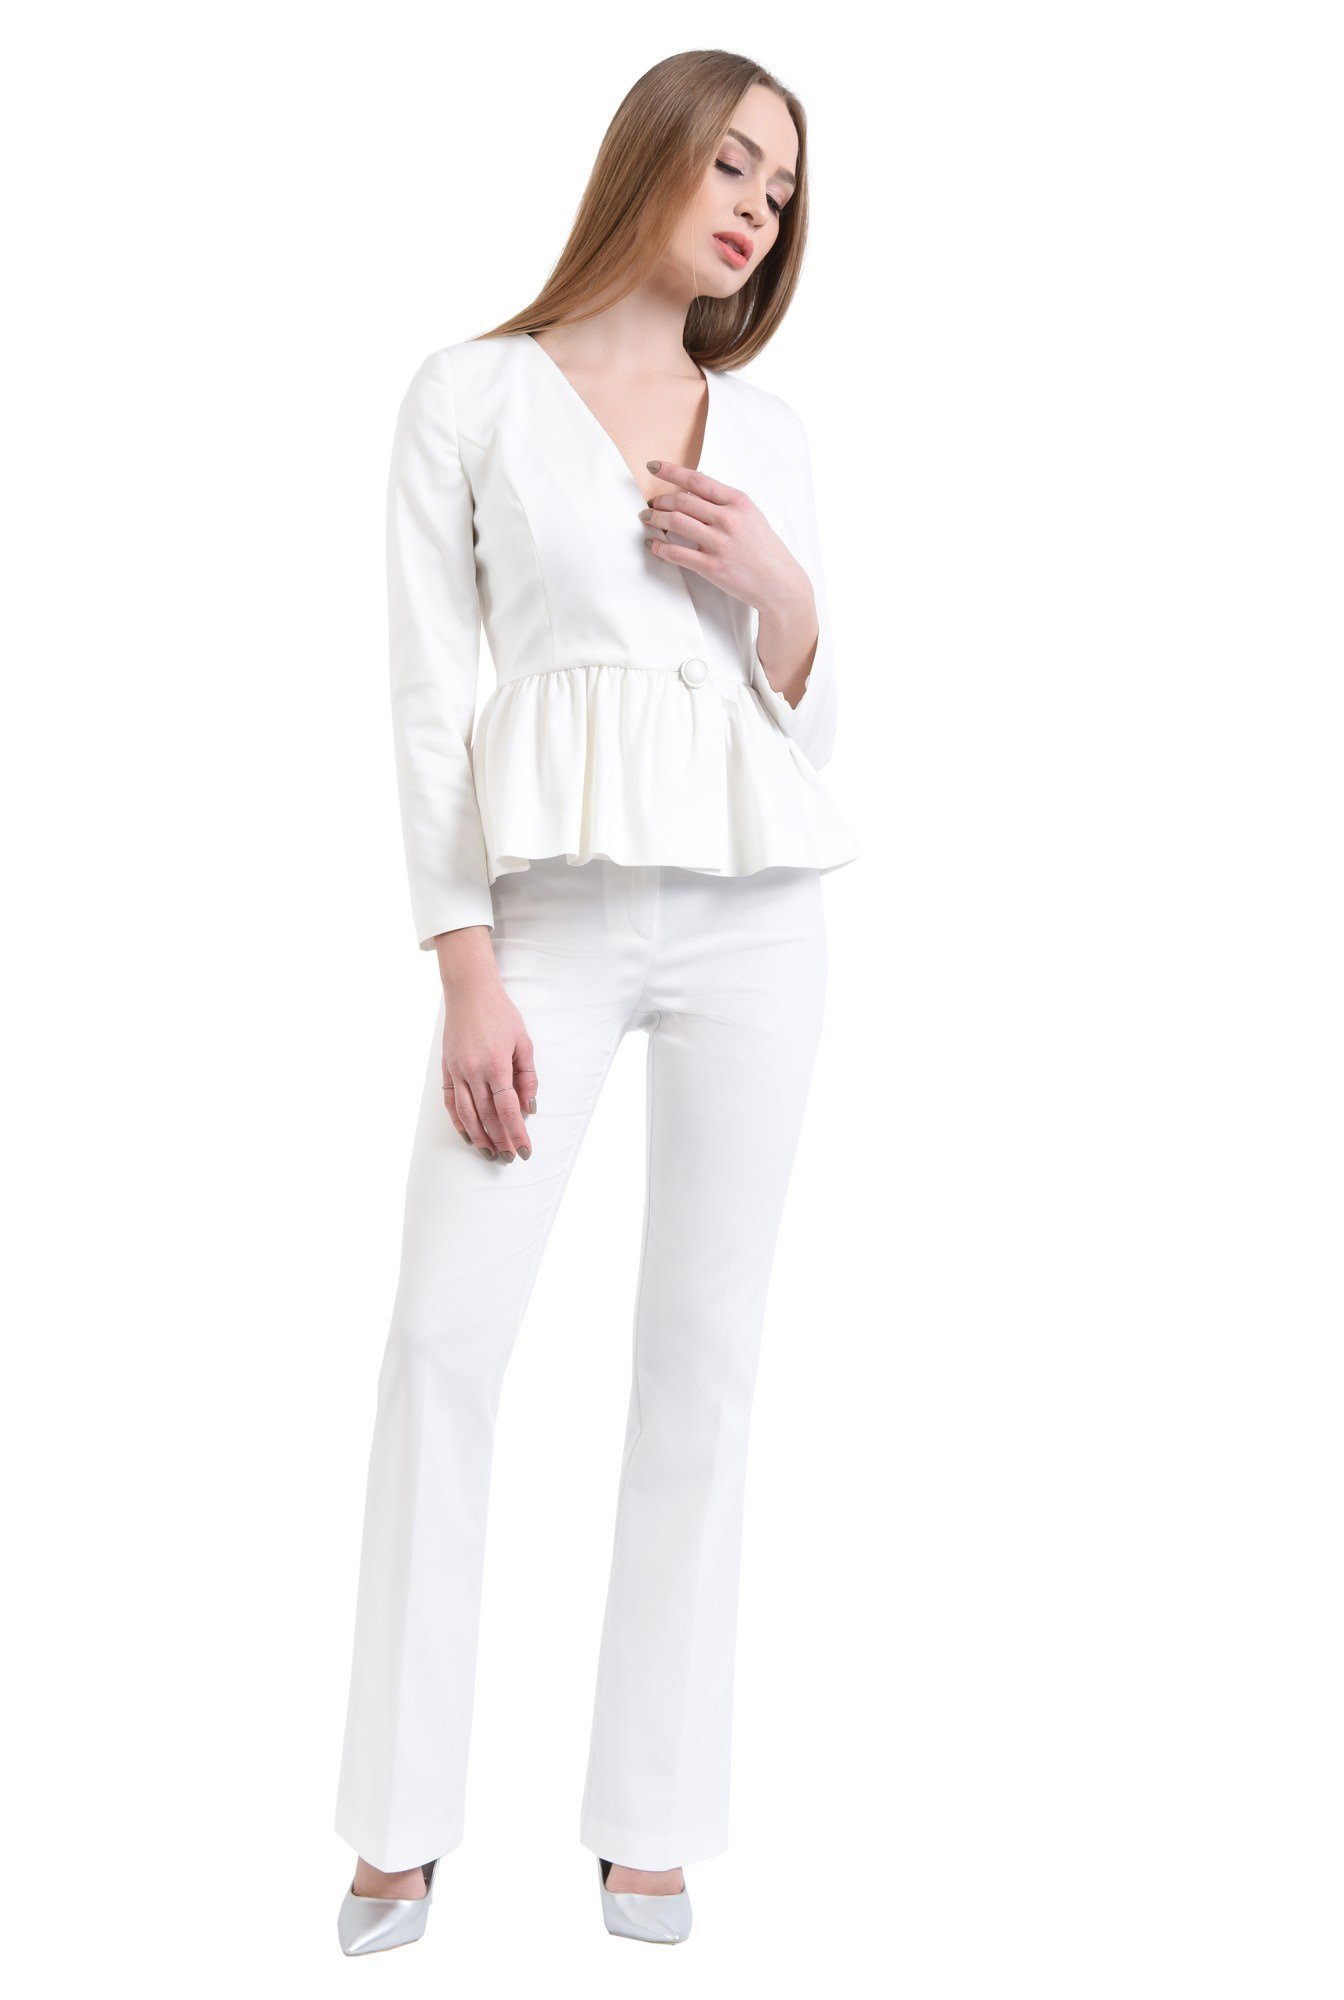 3 - 360 - Sacou casual alb, inchidere cu nasture decorativ